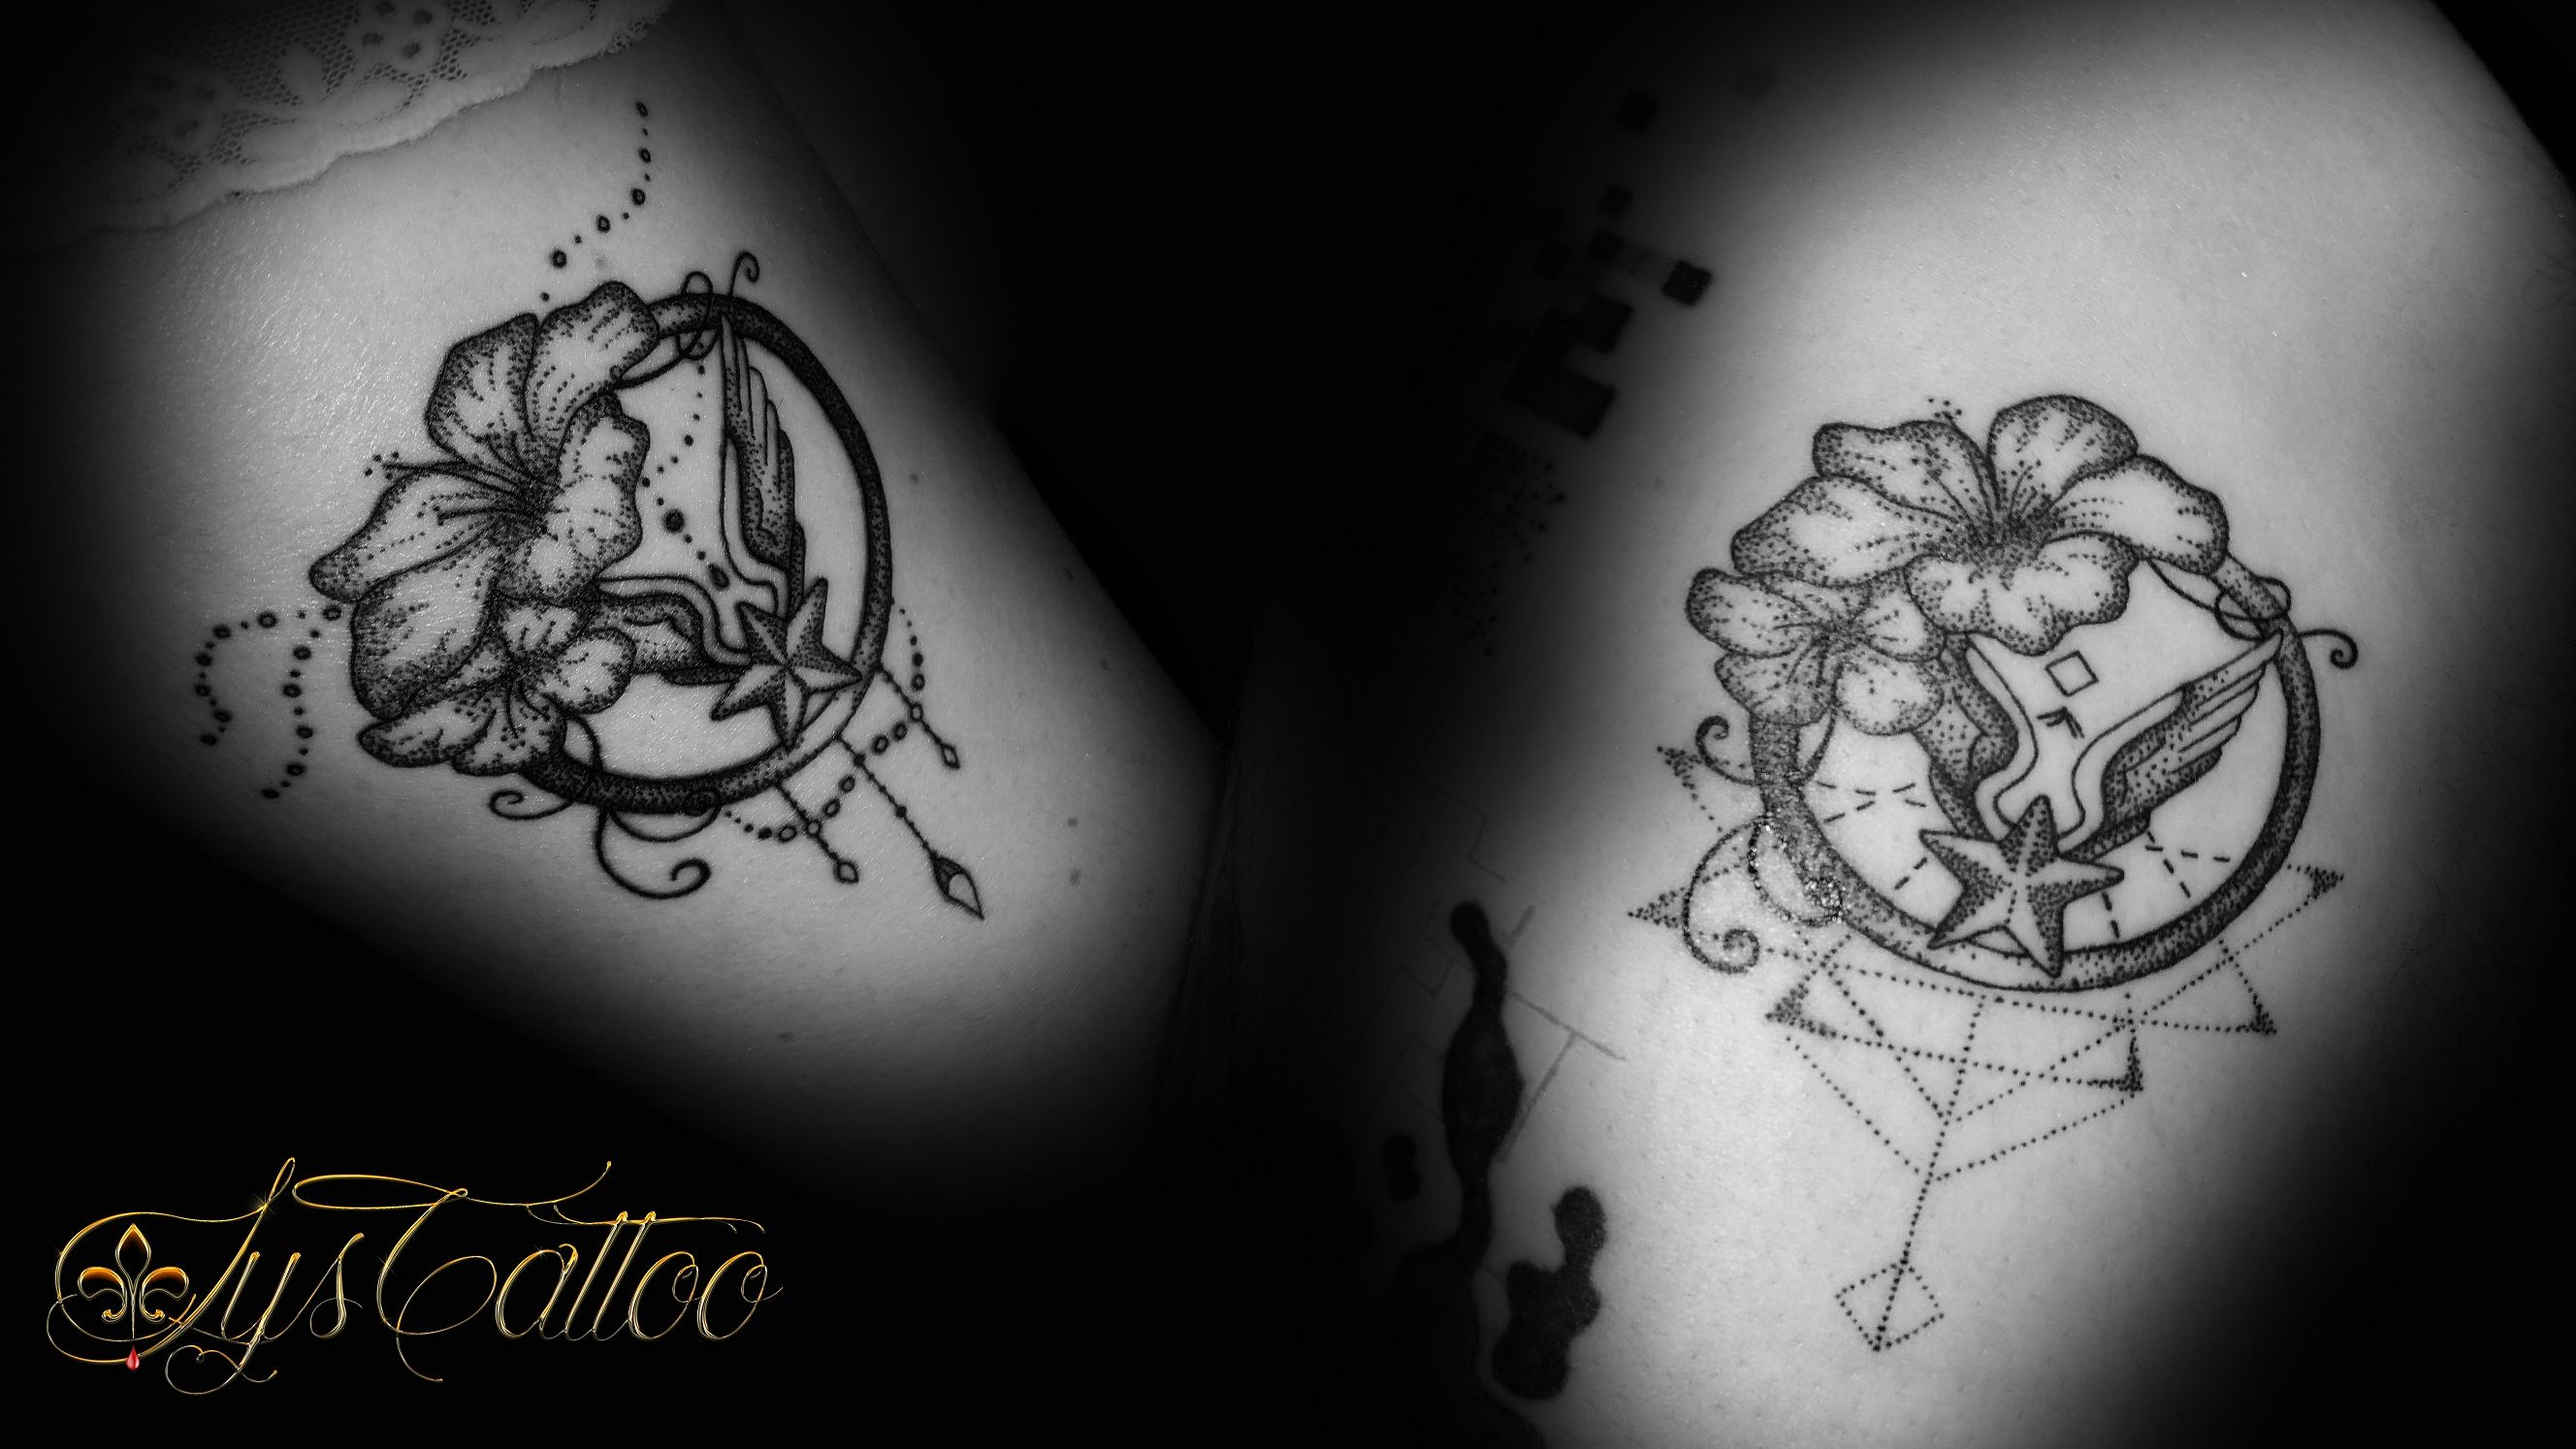 tatouage frere et soeur symbole. Black Bedroom Furniture Sets. Home Design Ideas